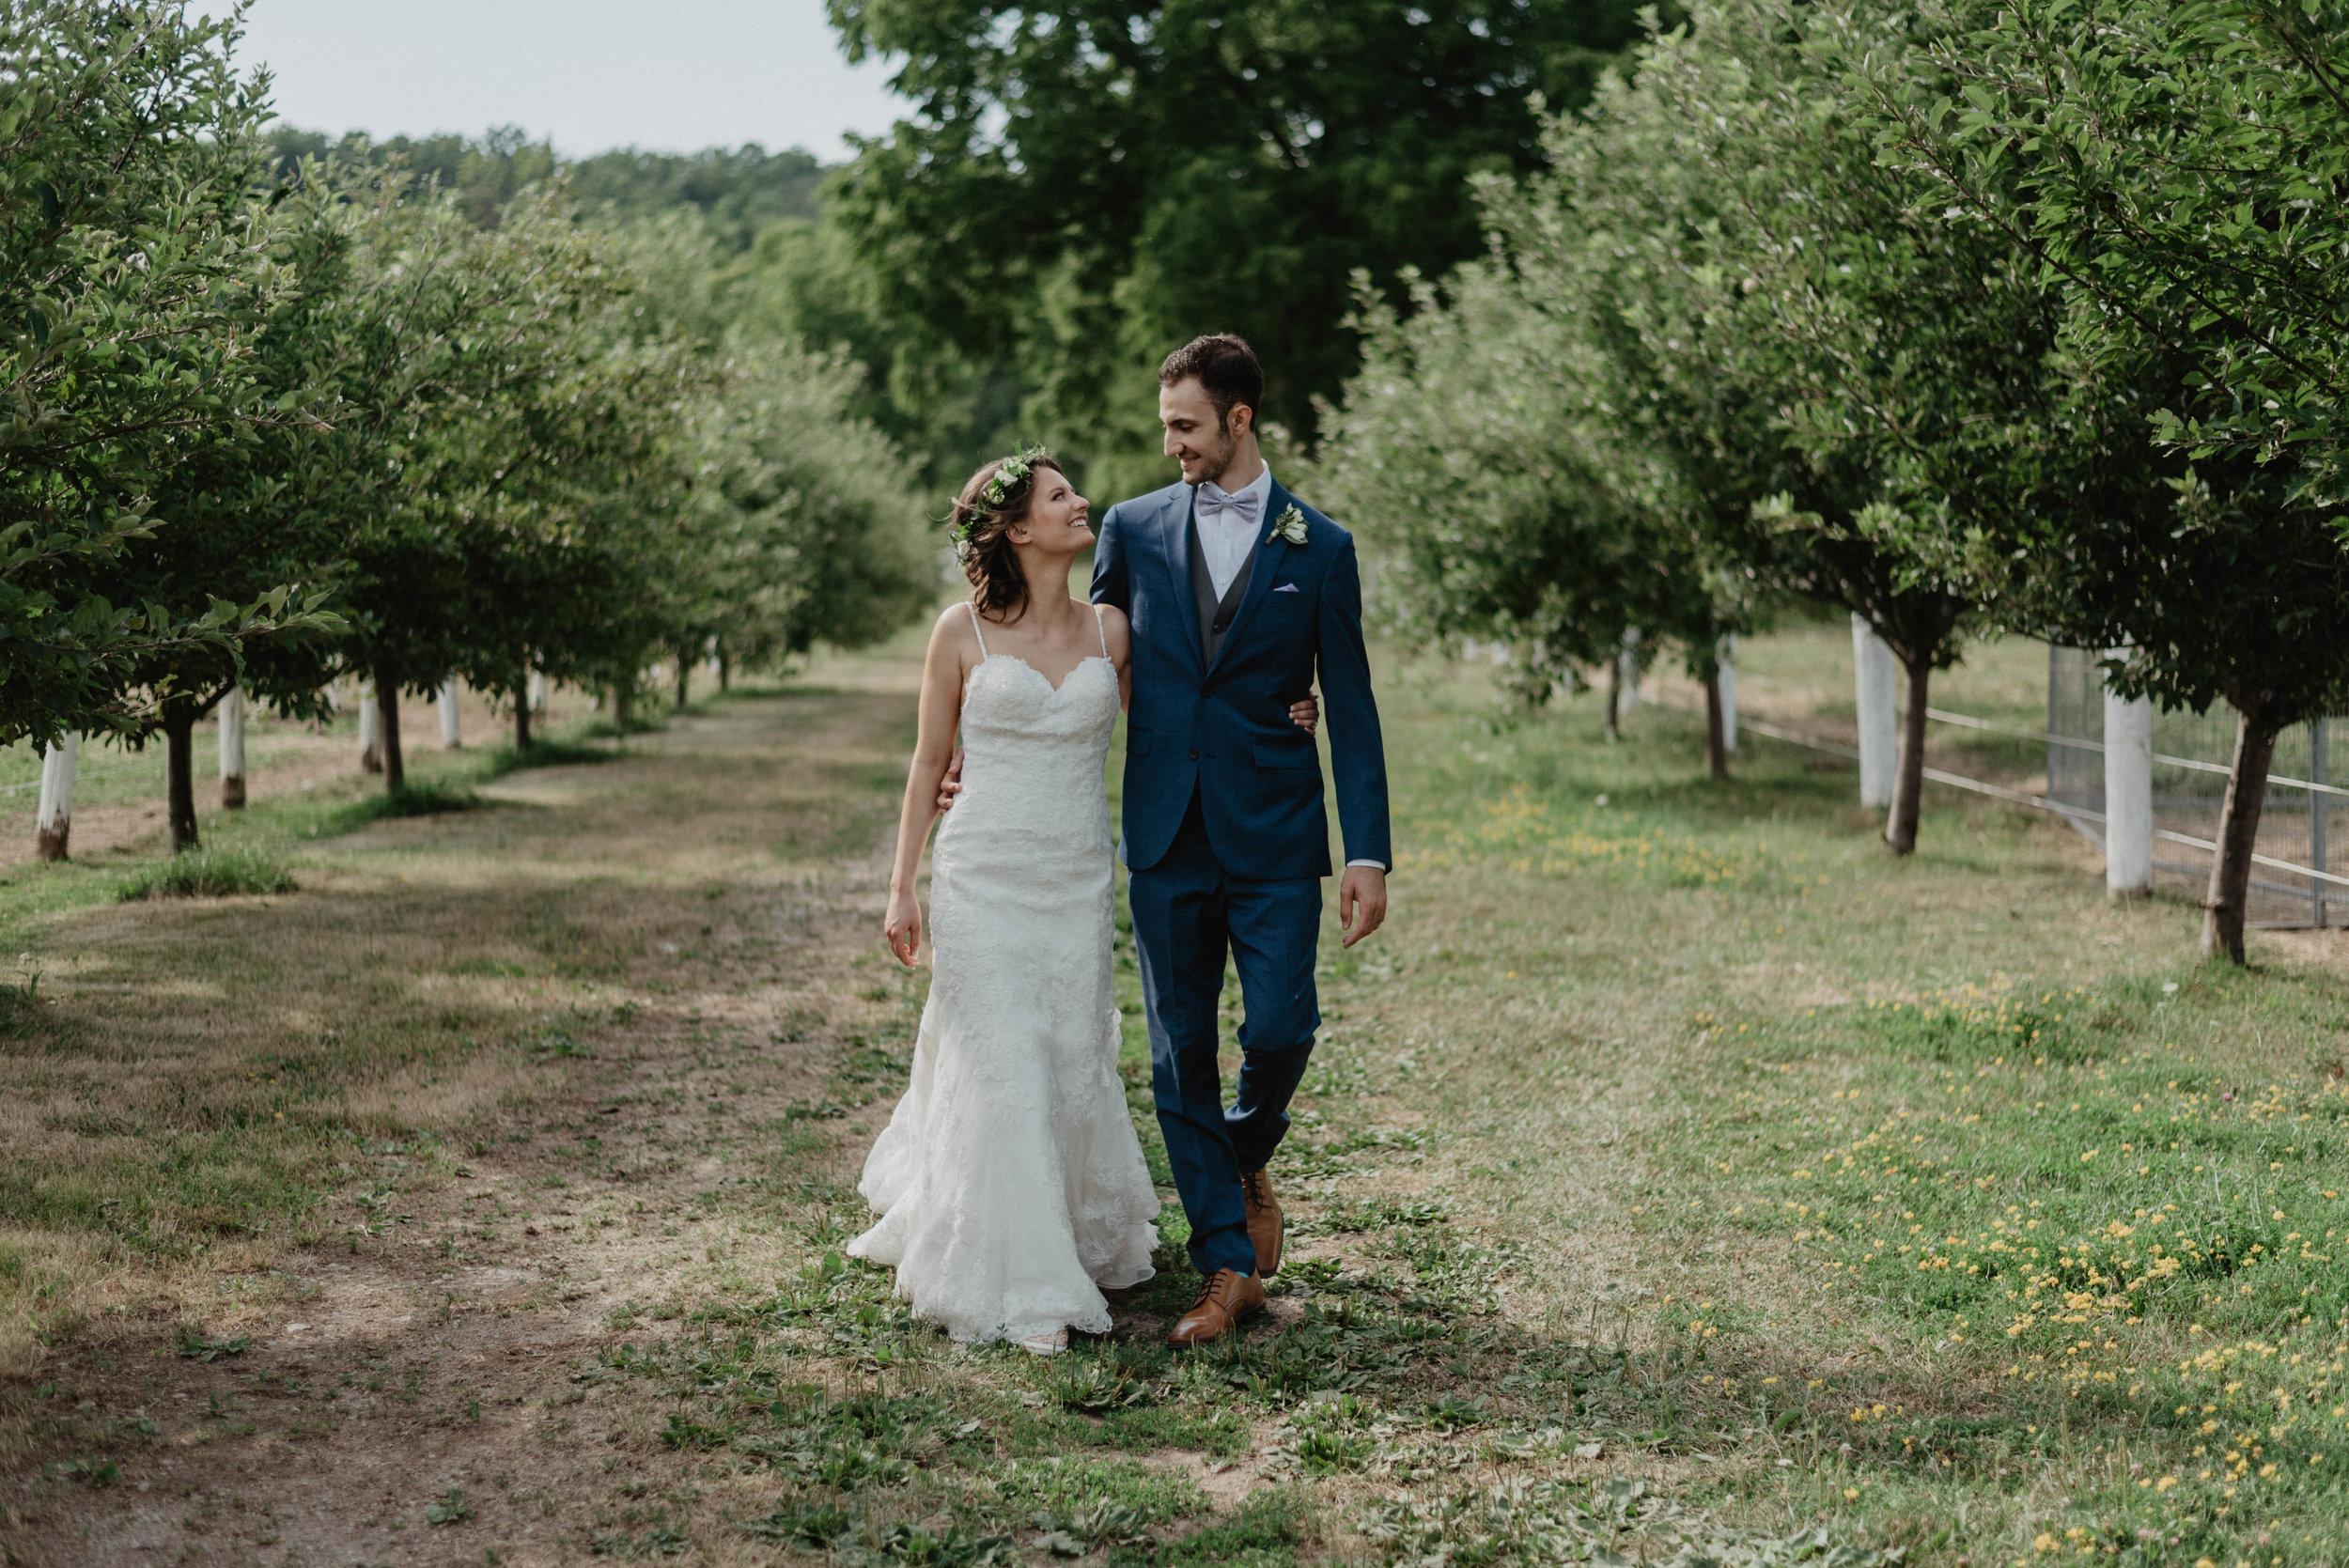 Apple orchard wedding portrait